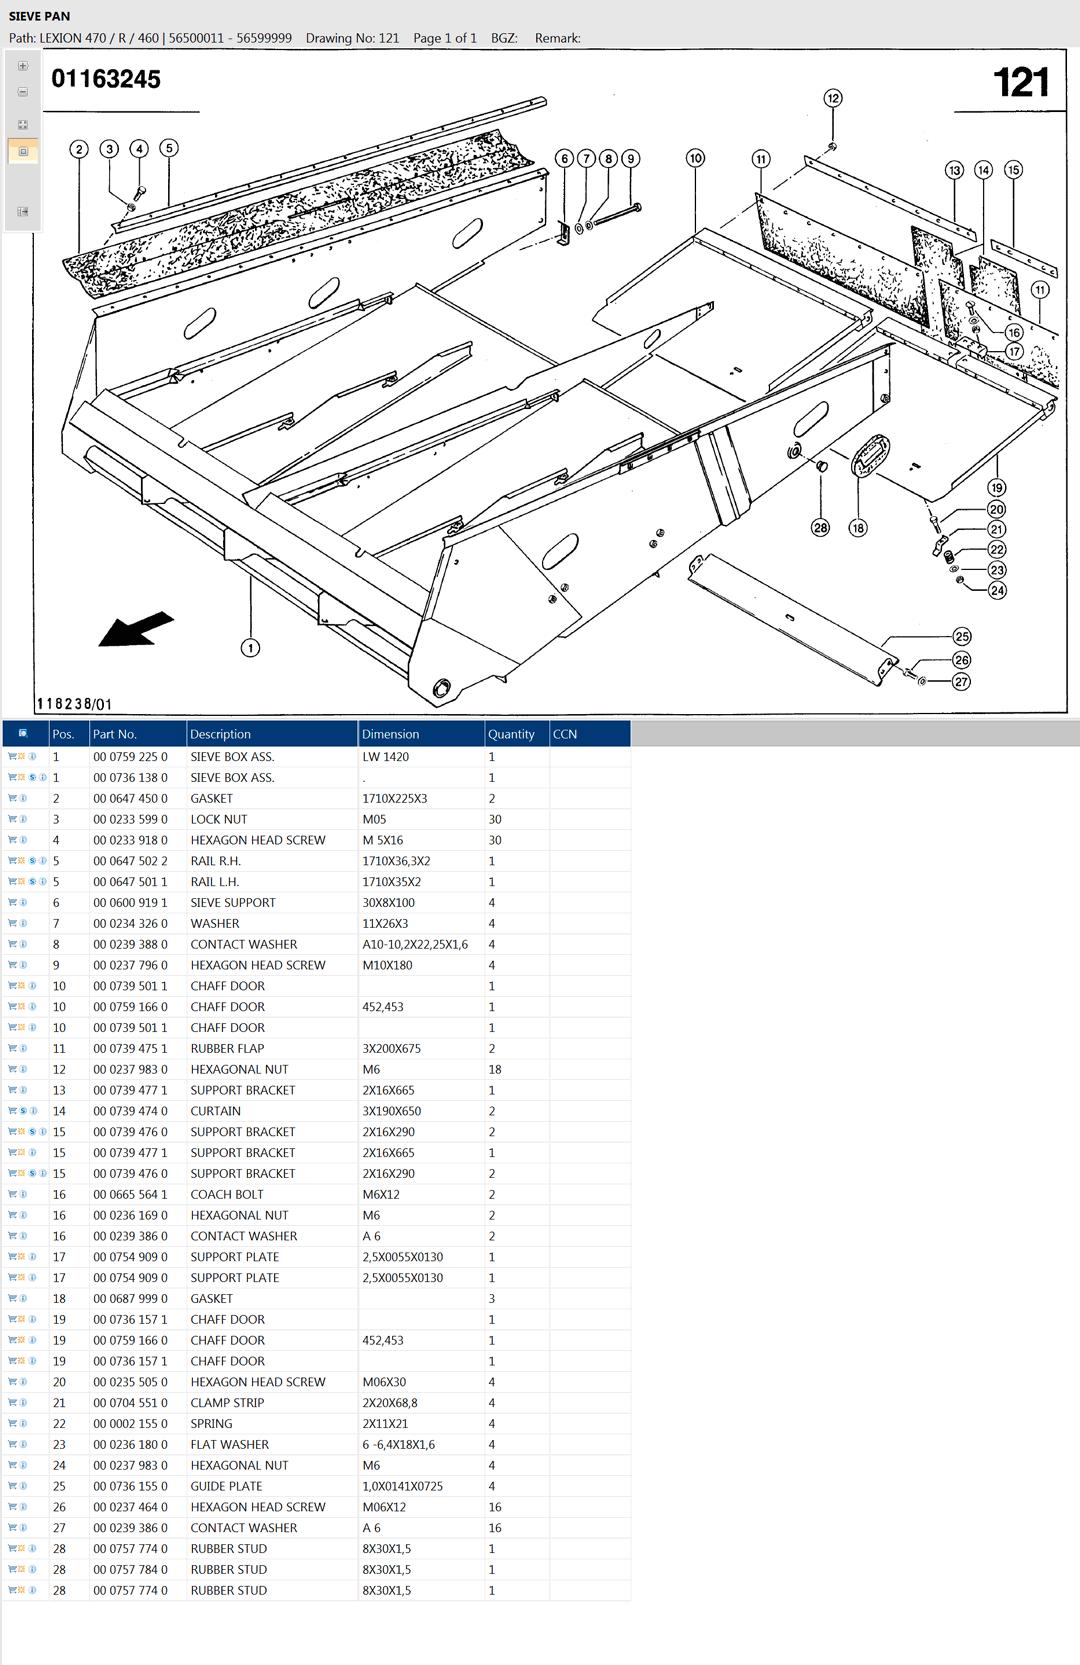 Lexion 470R parts and scheme - sieve pan